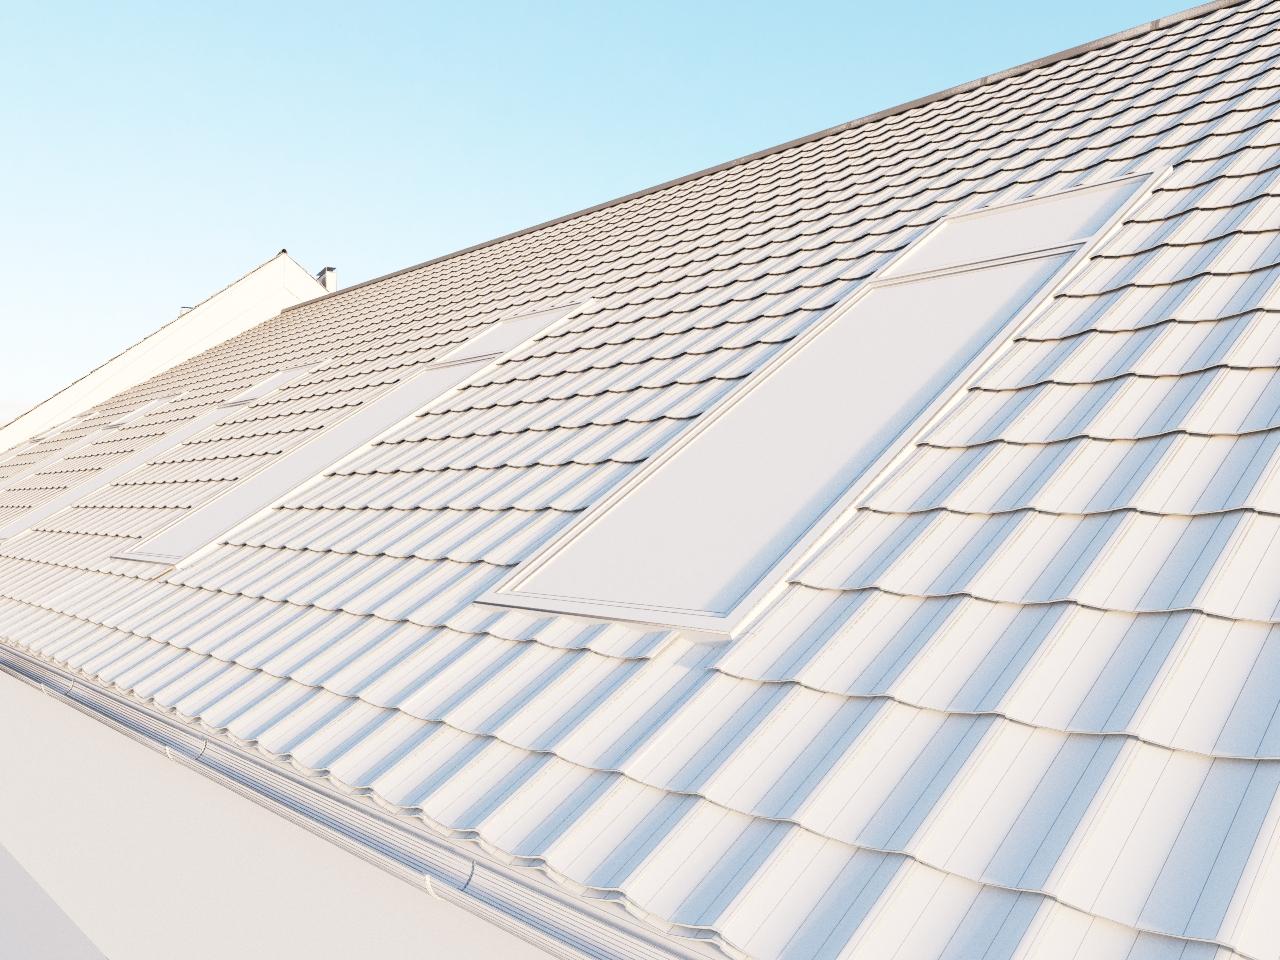 Batlzal Roof Designer plugin were used to model tiled roof. 3D Architect.